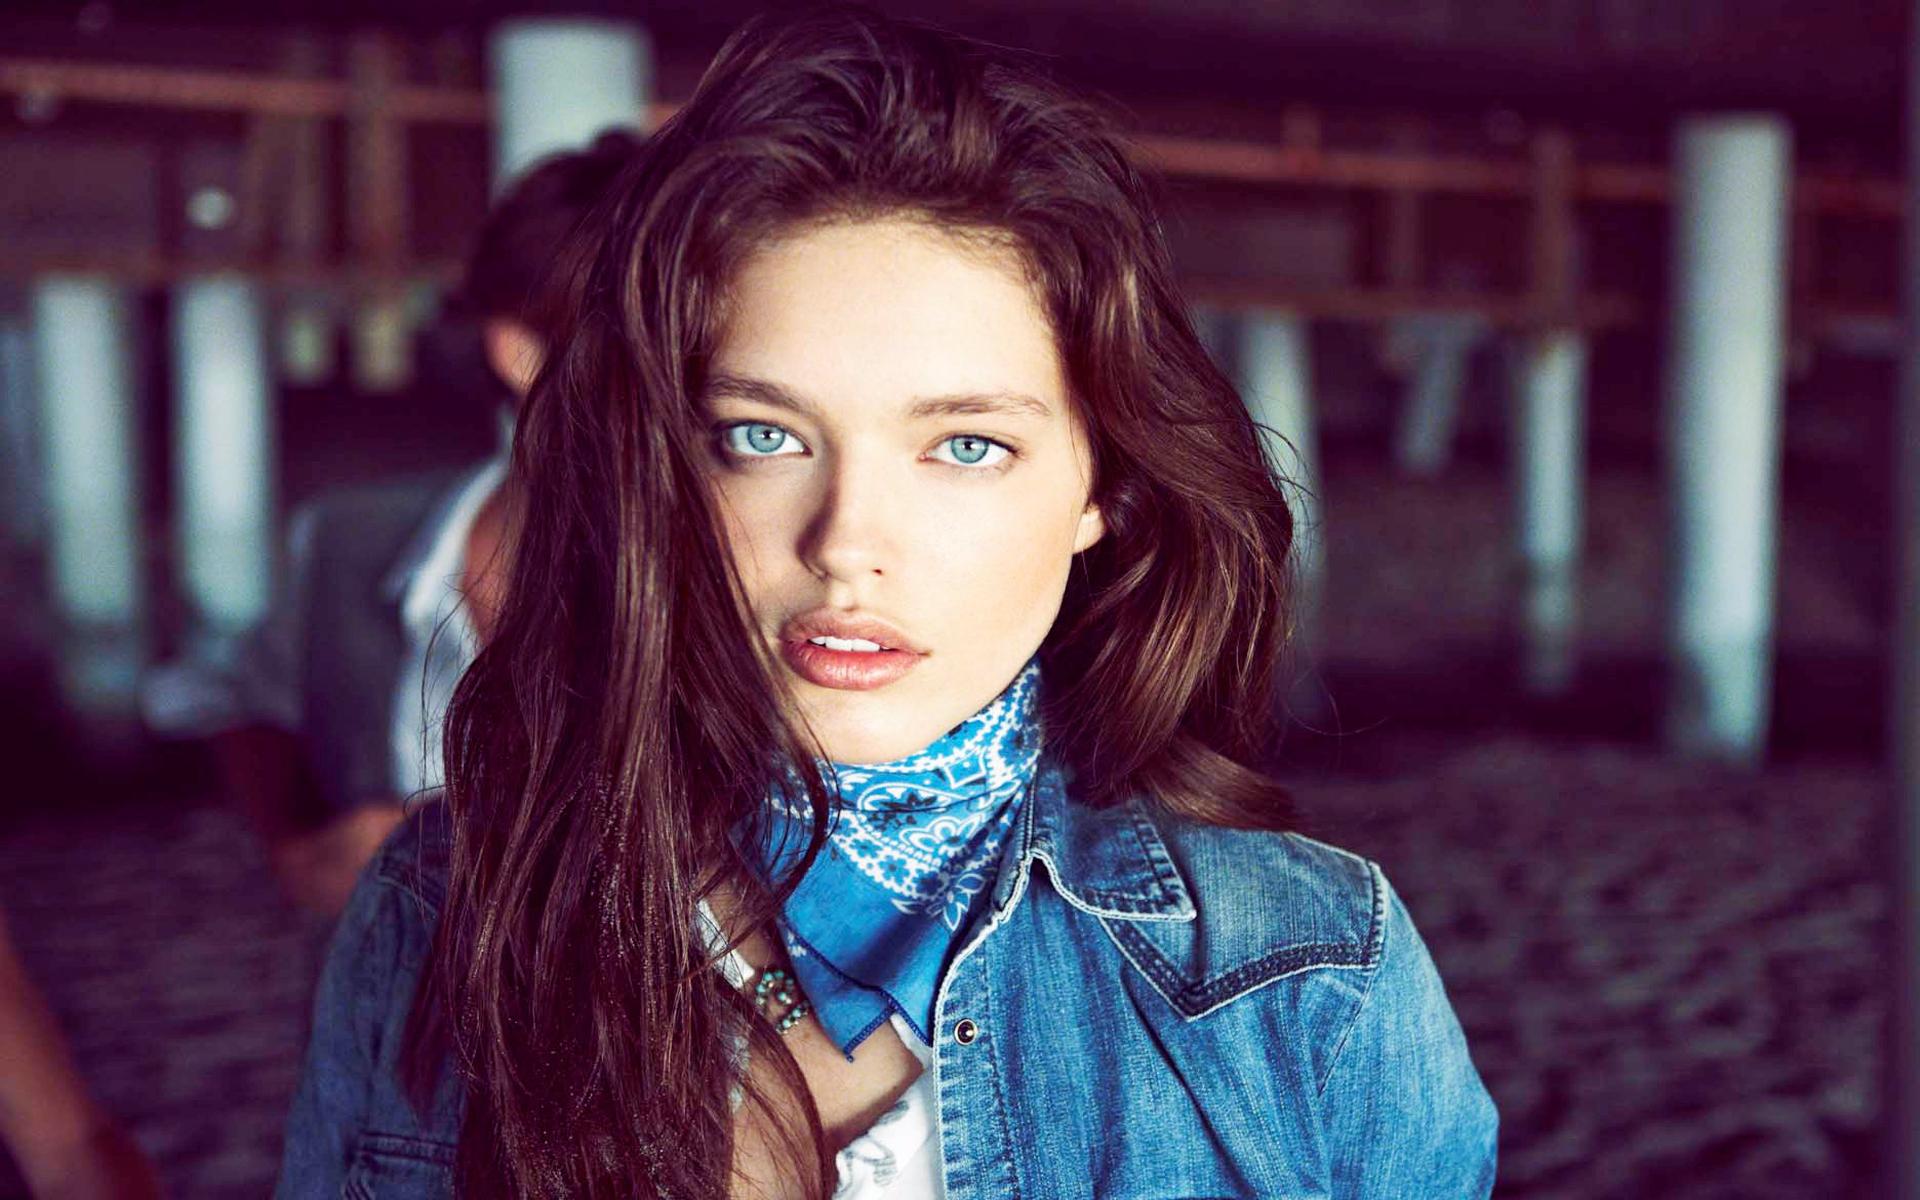 24 Emily Didonato HD Wallpapers | Backgrounds - Wallpaper ...